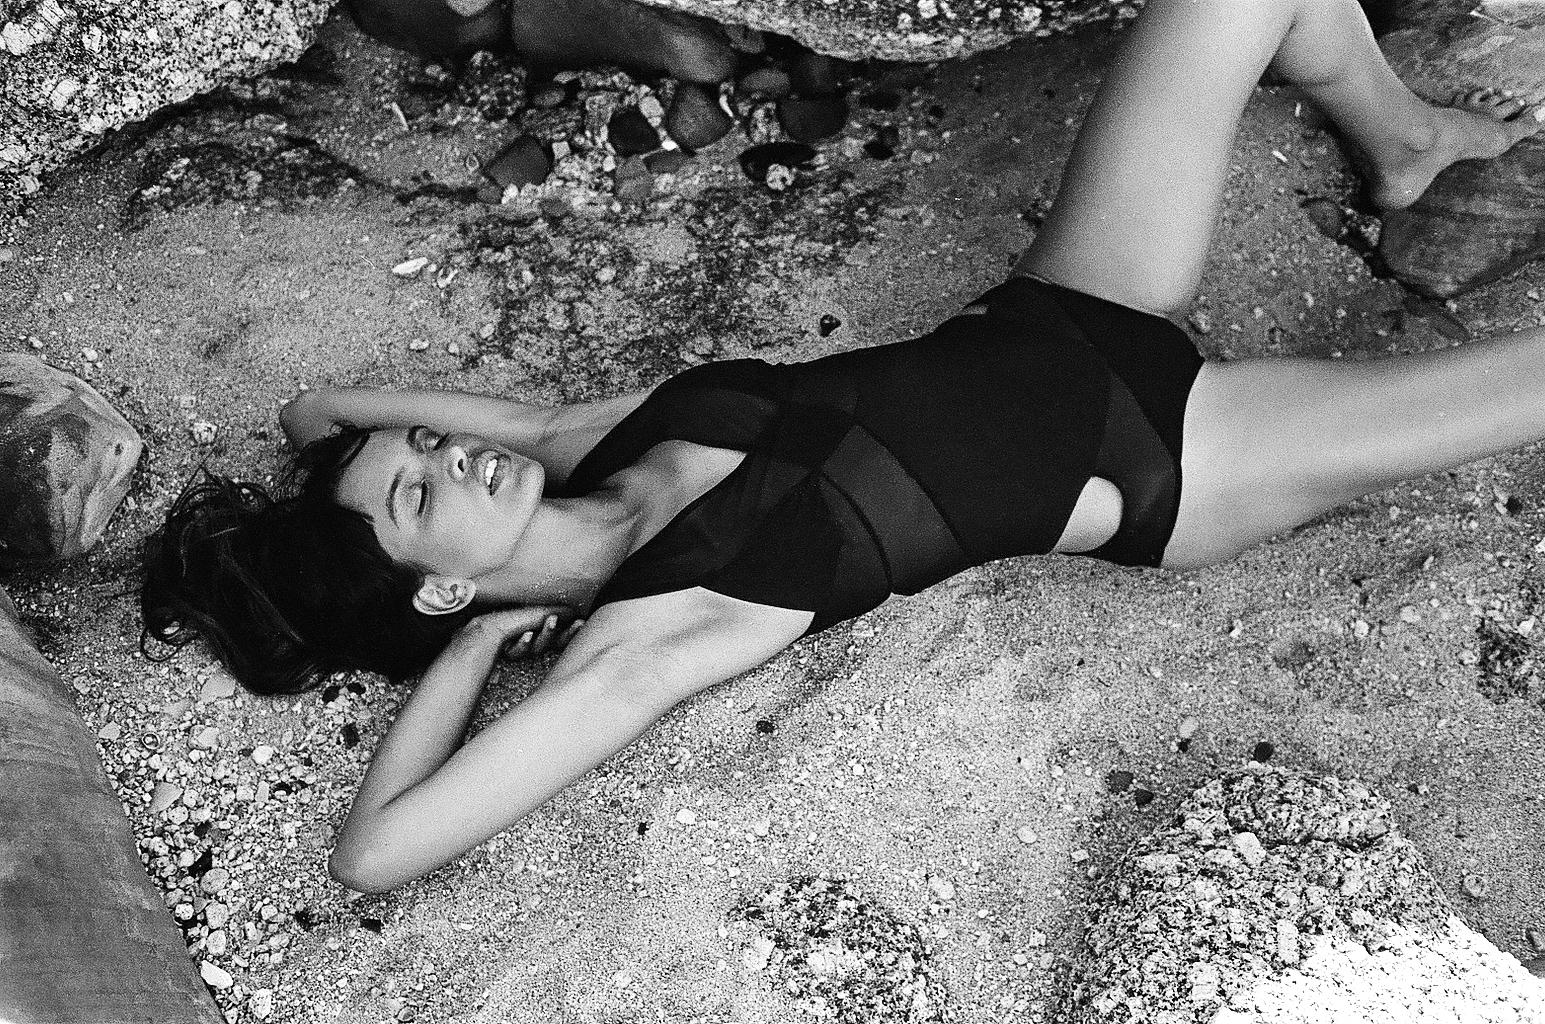 Helena Gomes bikini model